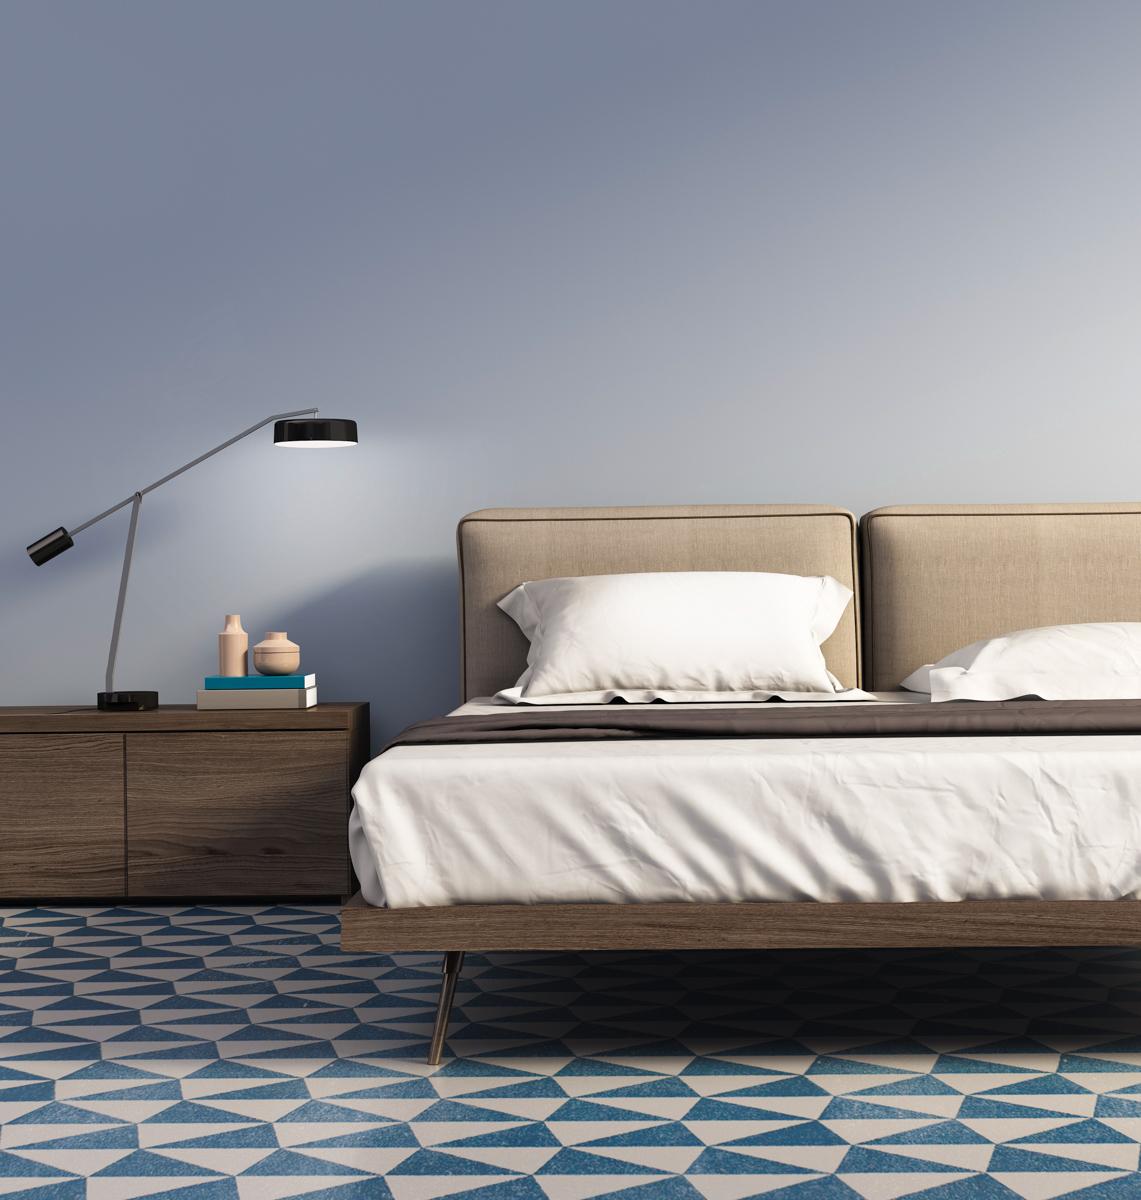 zagasito-plava-spavaca-soba-krevet-domnakvadrat